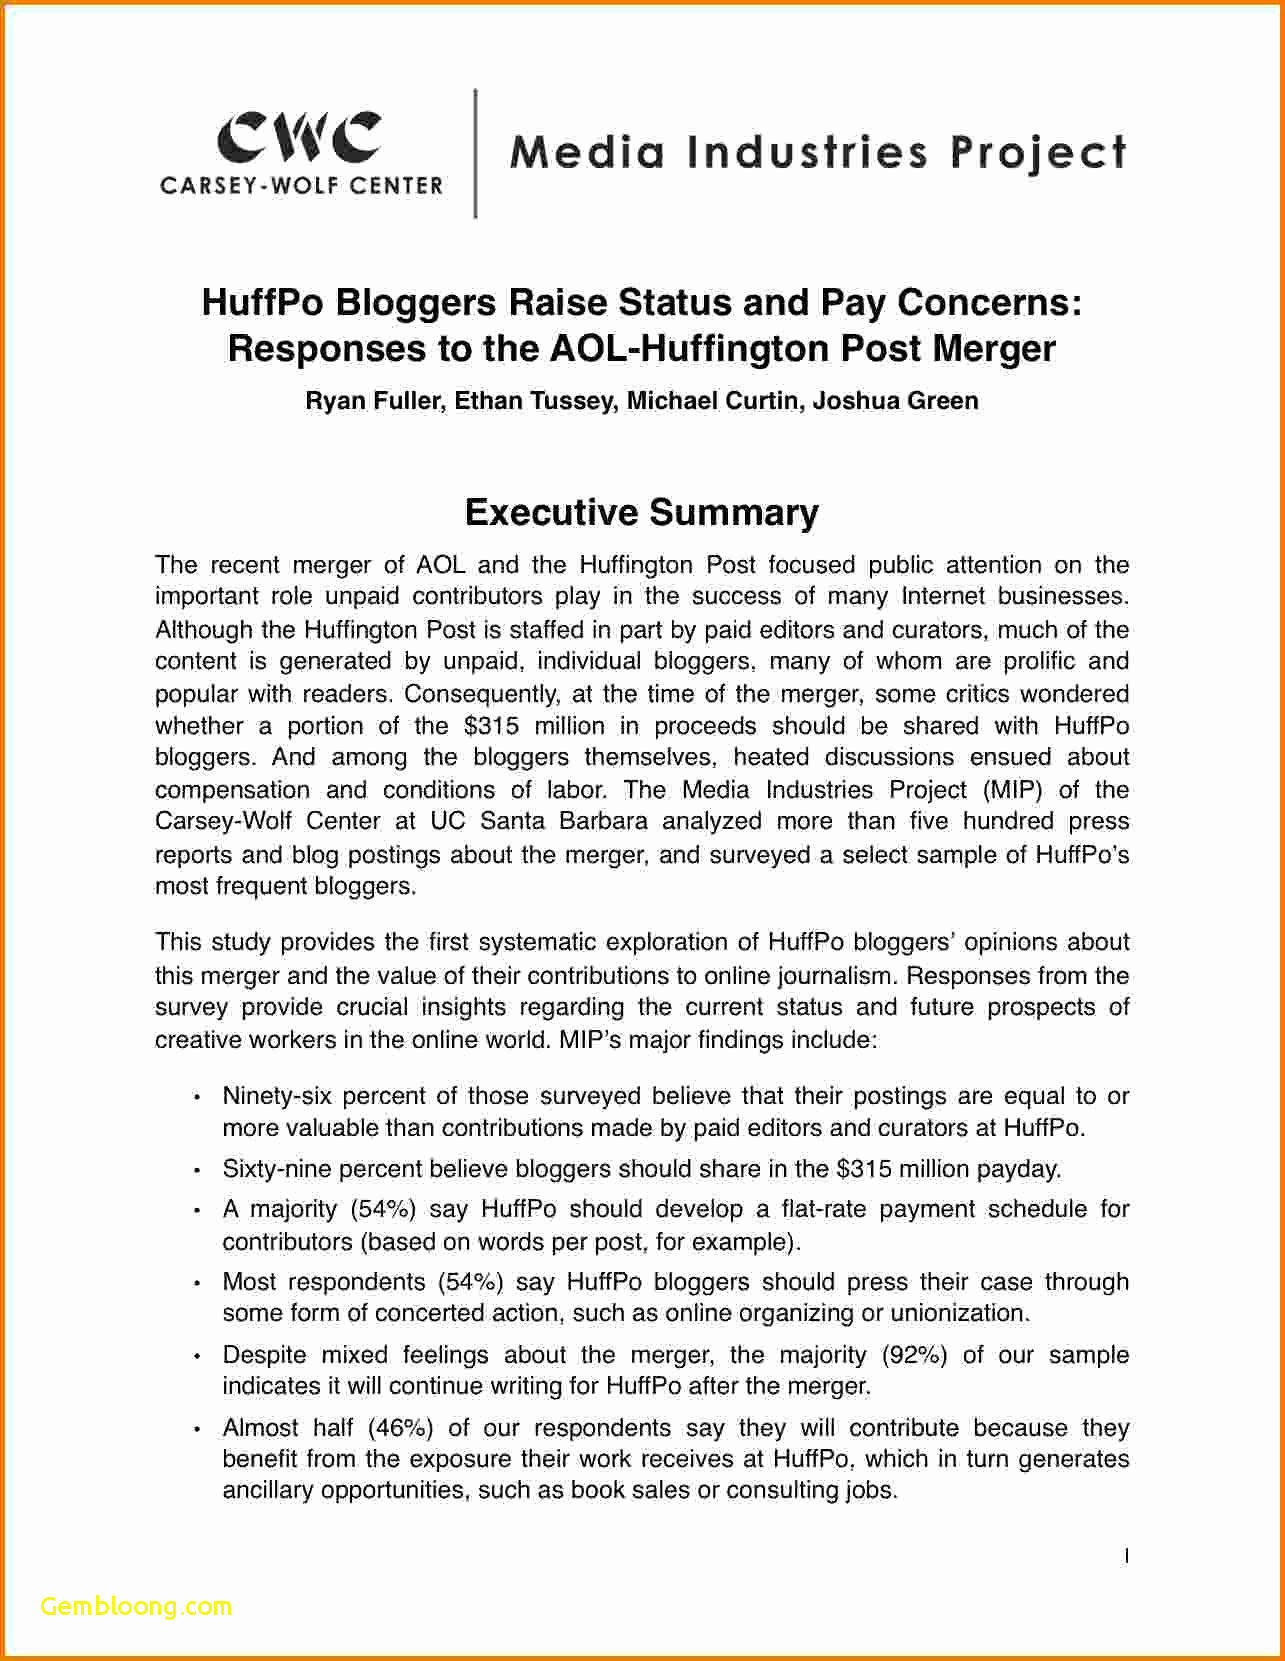 Executive Summary Example Business Plan Elegant 9 Executive Summary Marketing Plan Examples Pdf Word